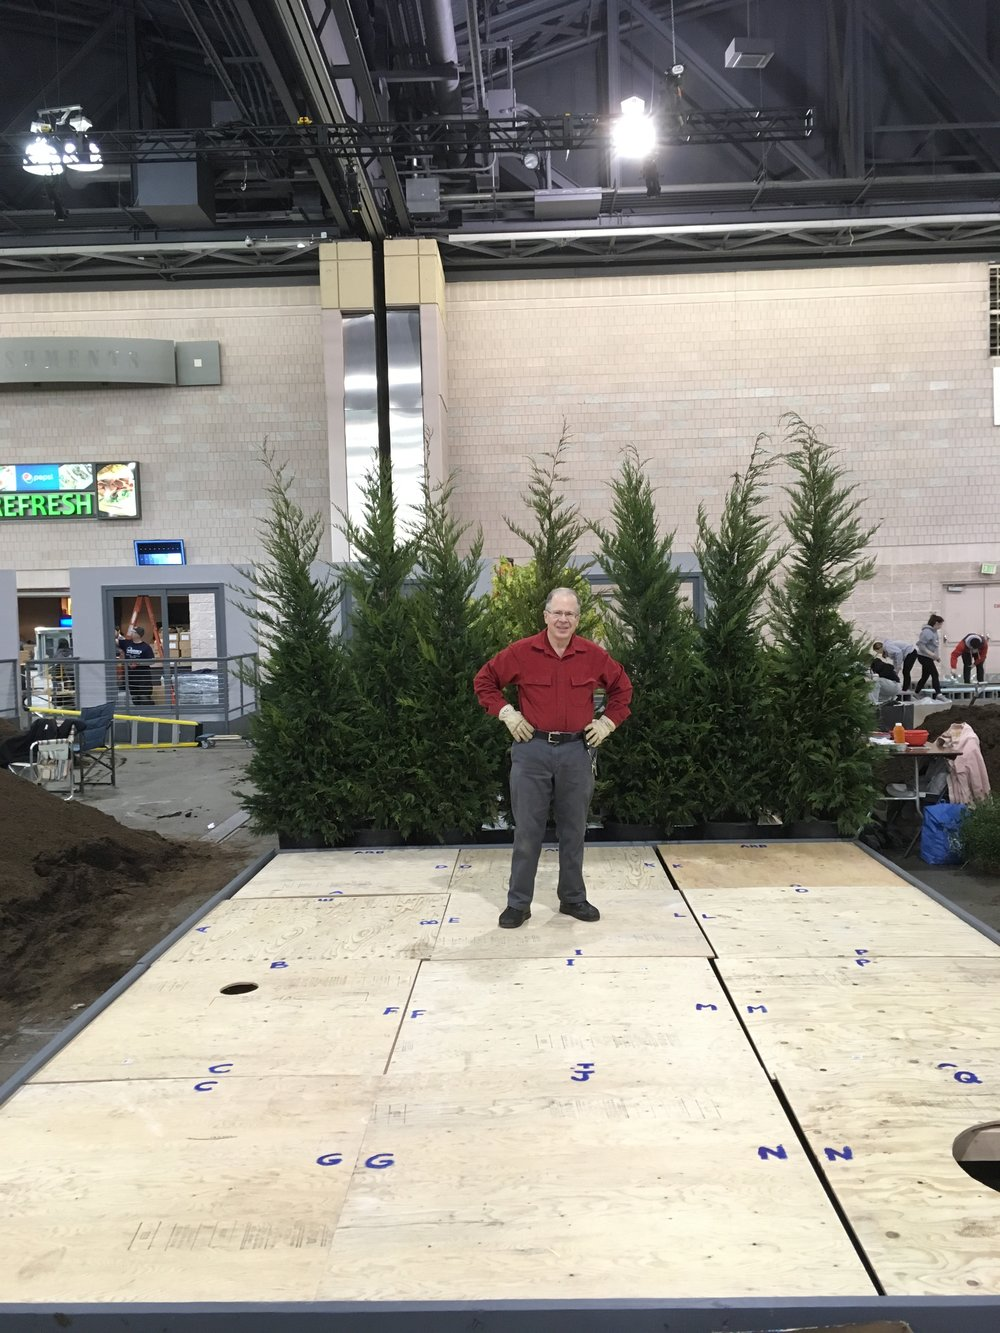 Here, Volunteer and Grave Gardener Joe Shapiro shows off the platform HE BUILT HIMSELF. Thank you, Joe!!